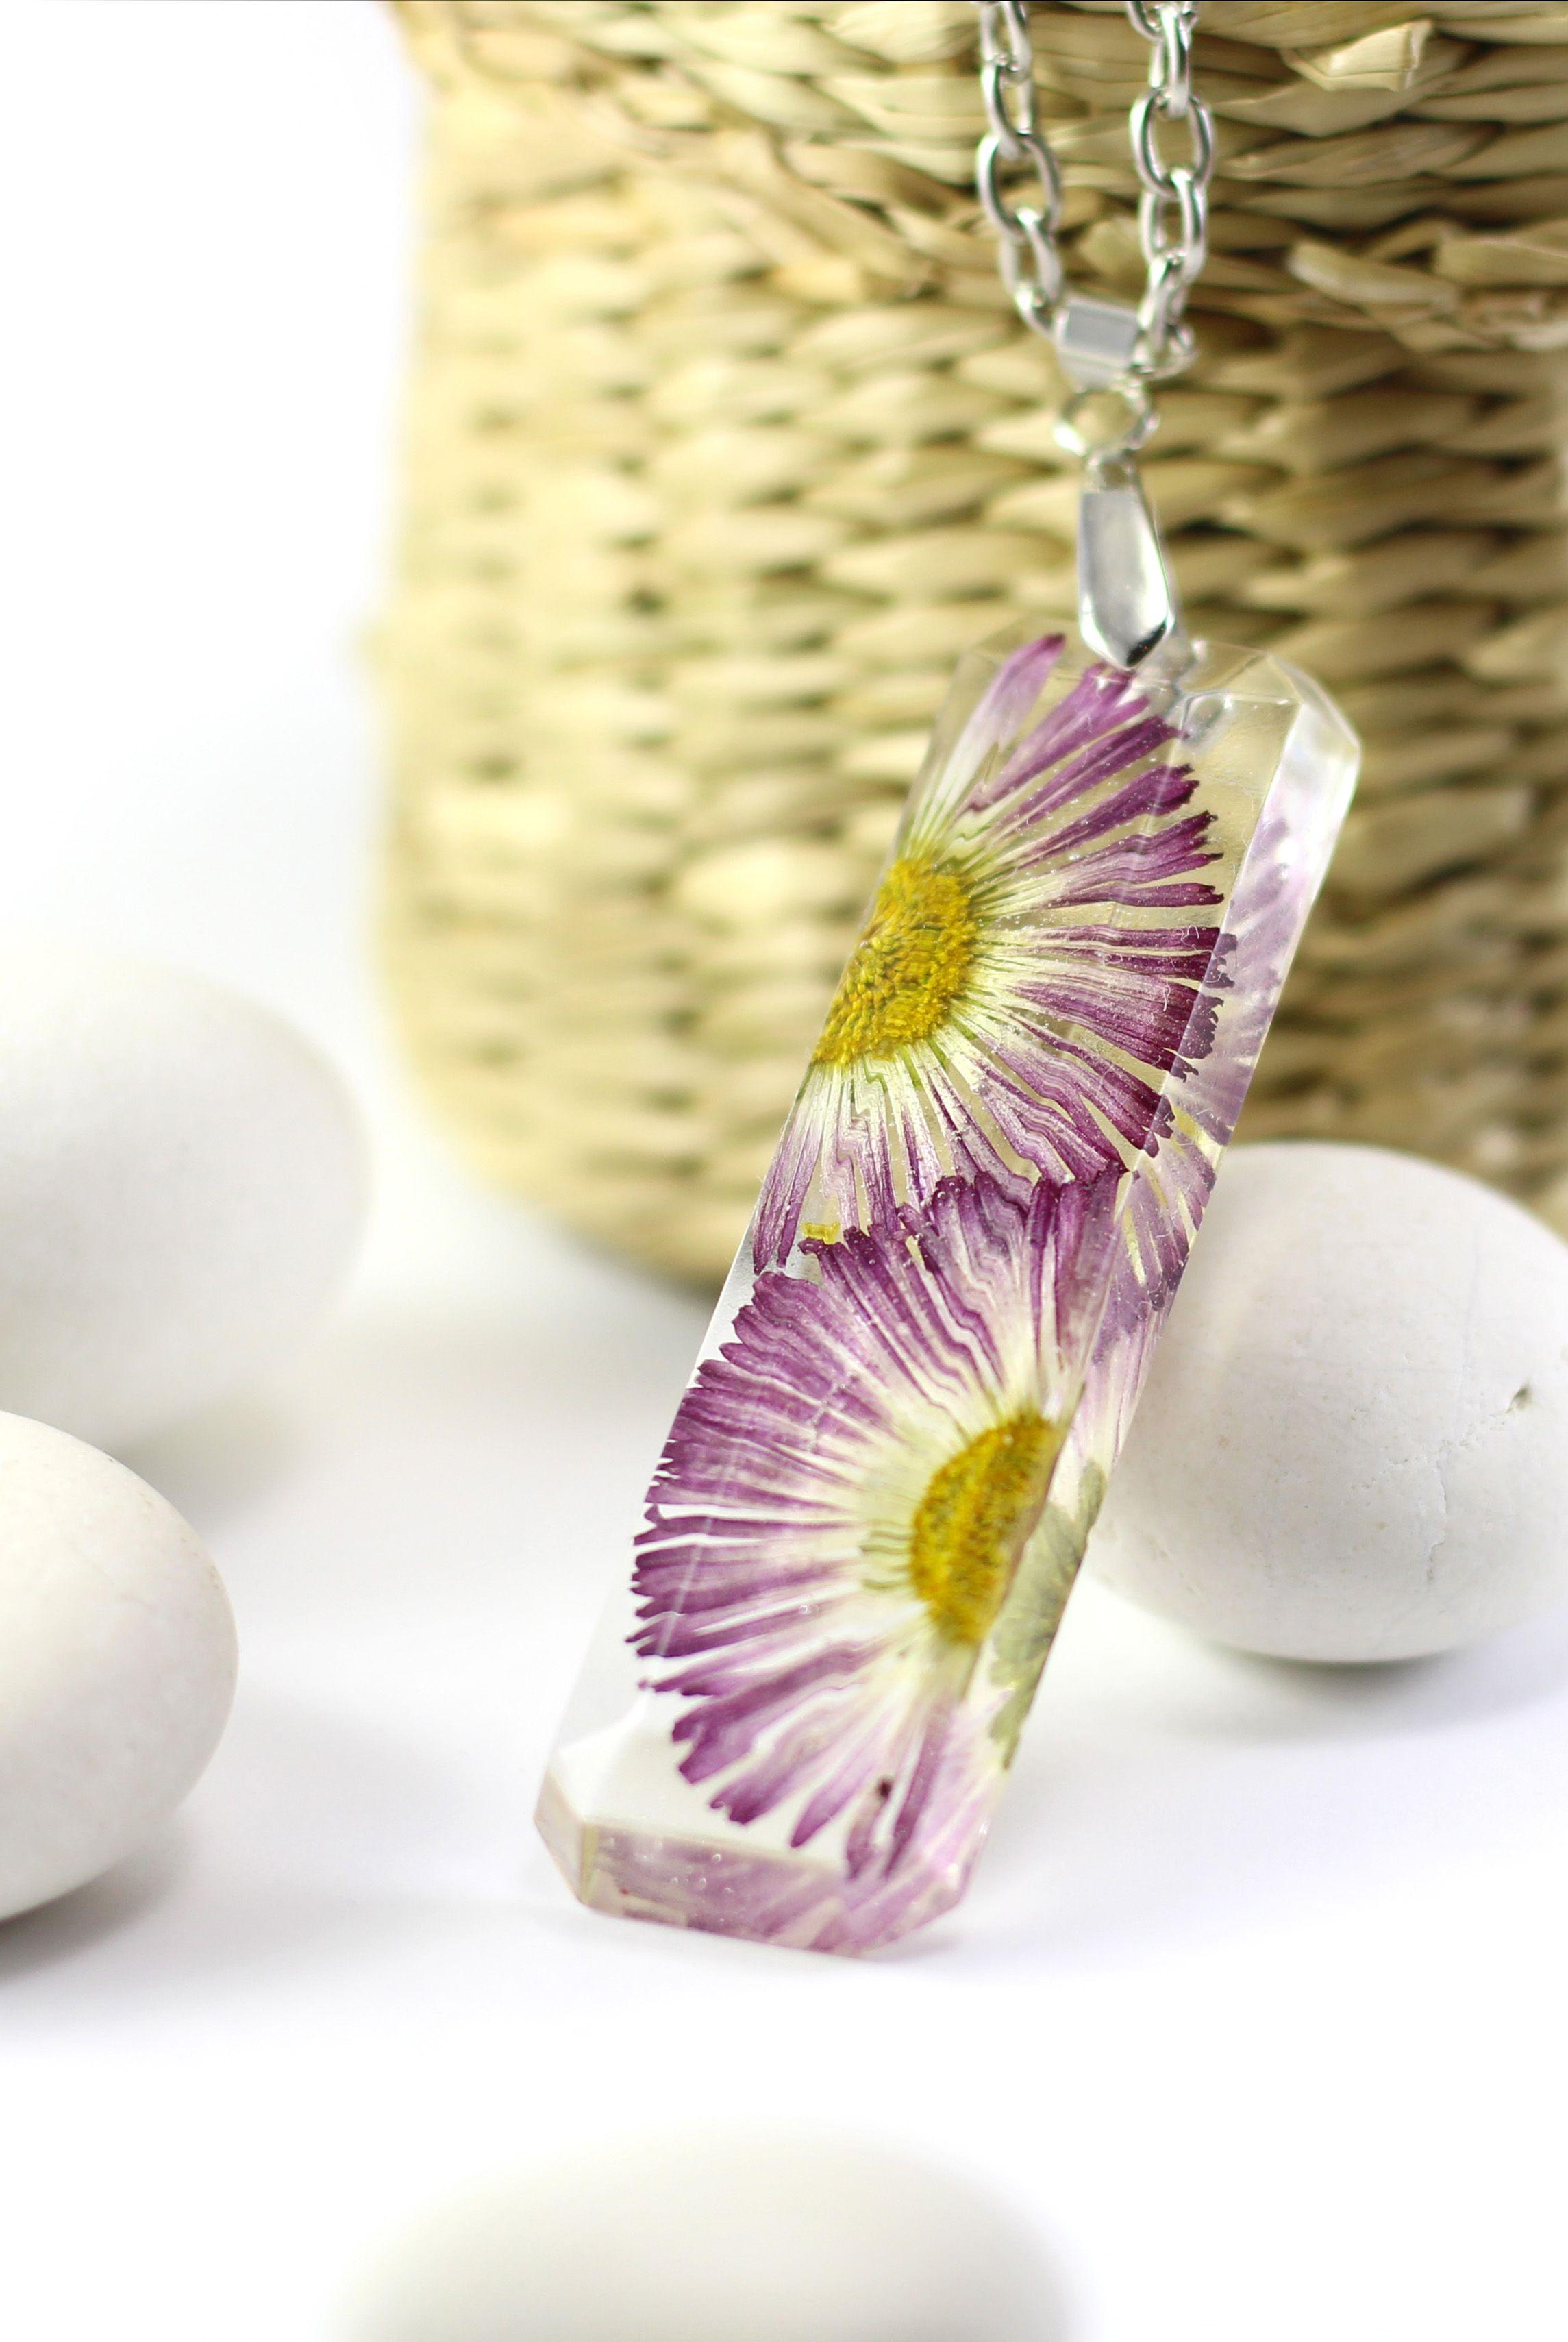 Resin Flower Necklace Resin Jewelry Elegant Jewelry Daisy Flowers Jewelry Bride Gift Ideas Bridesmaid Gif Resin Jewelry Flower Resin Jewelry Resin Flowers